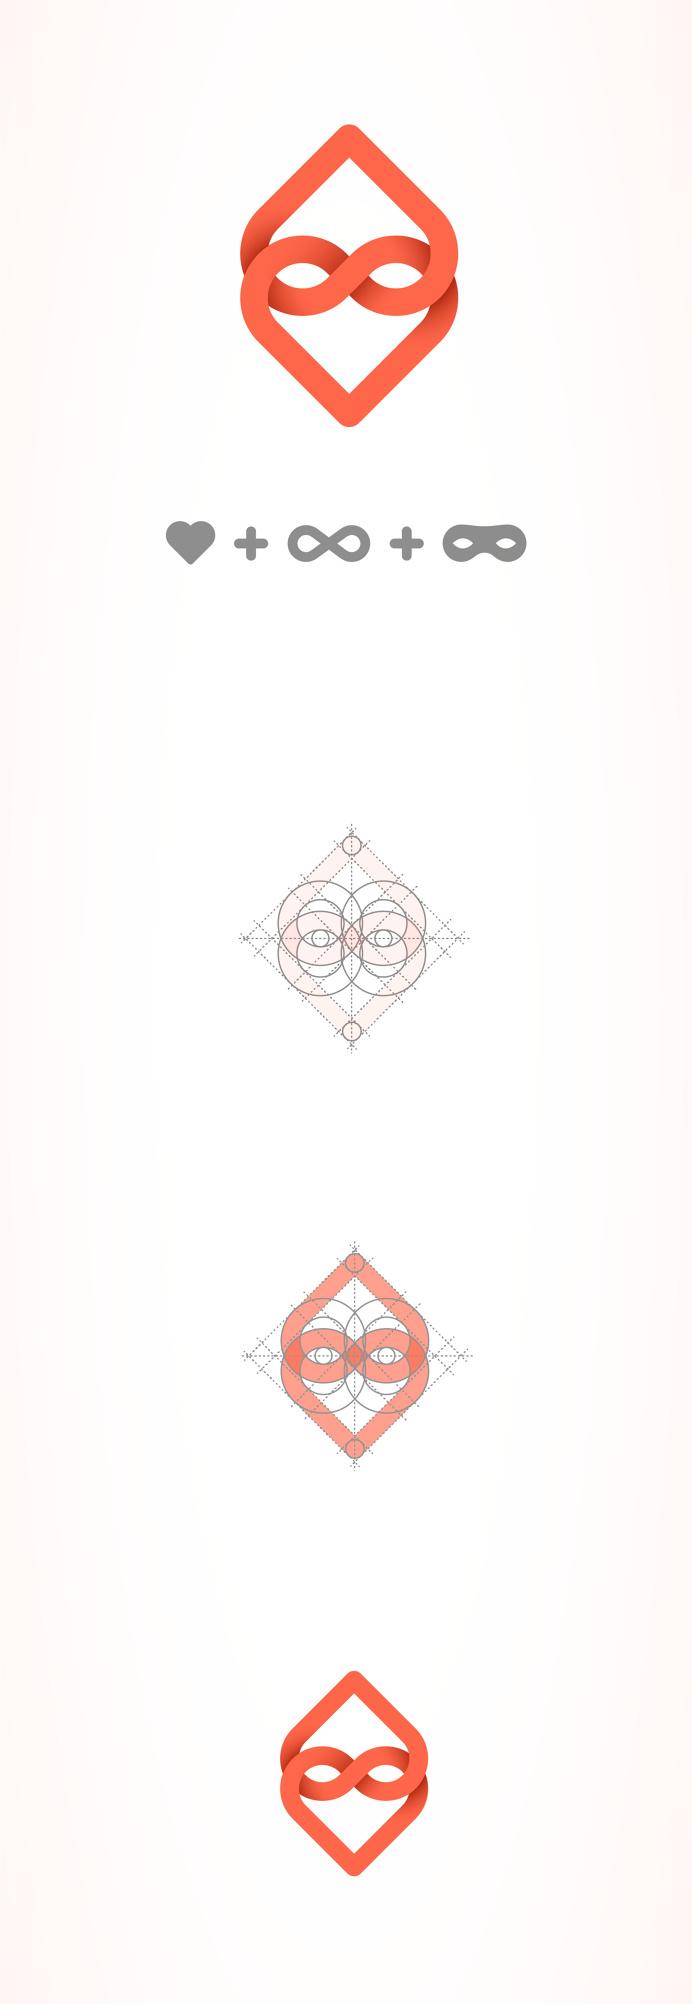 #logo #heart #branding #identity